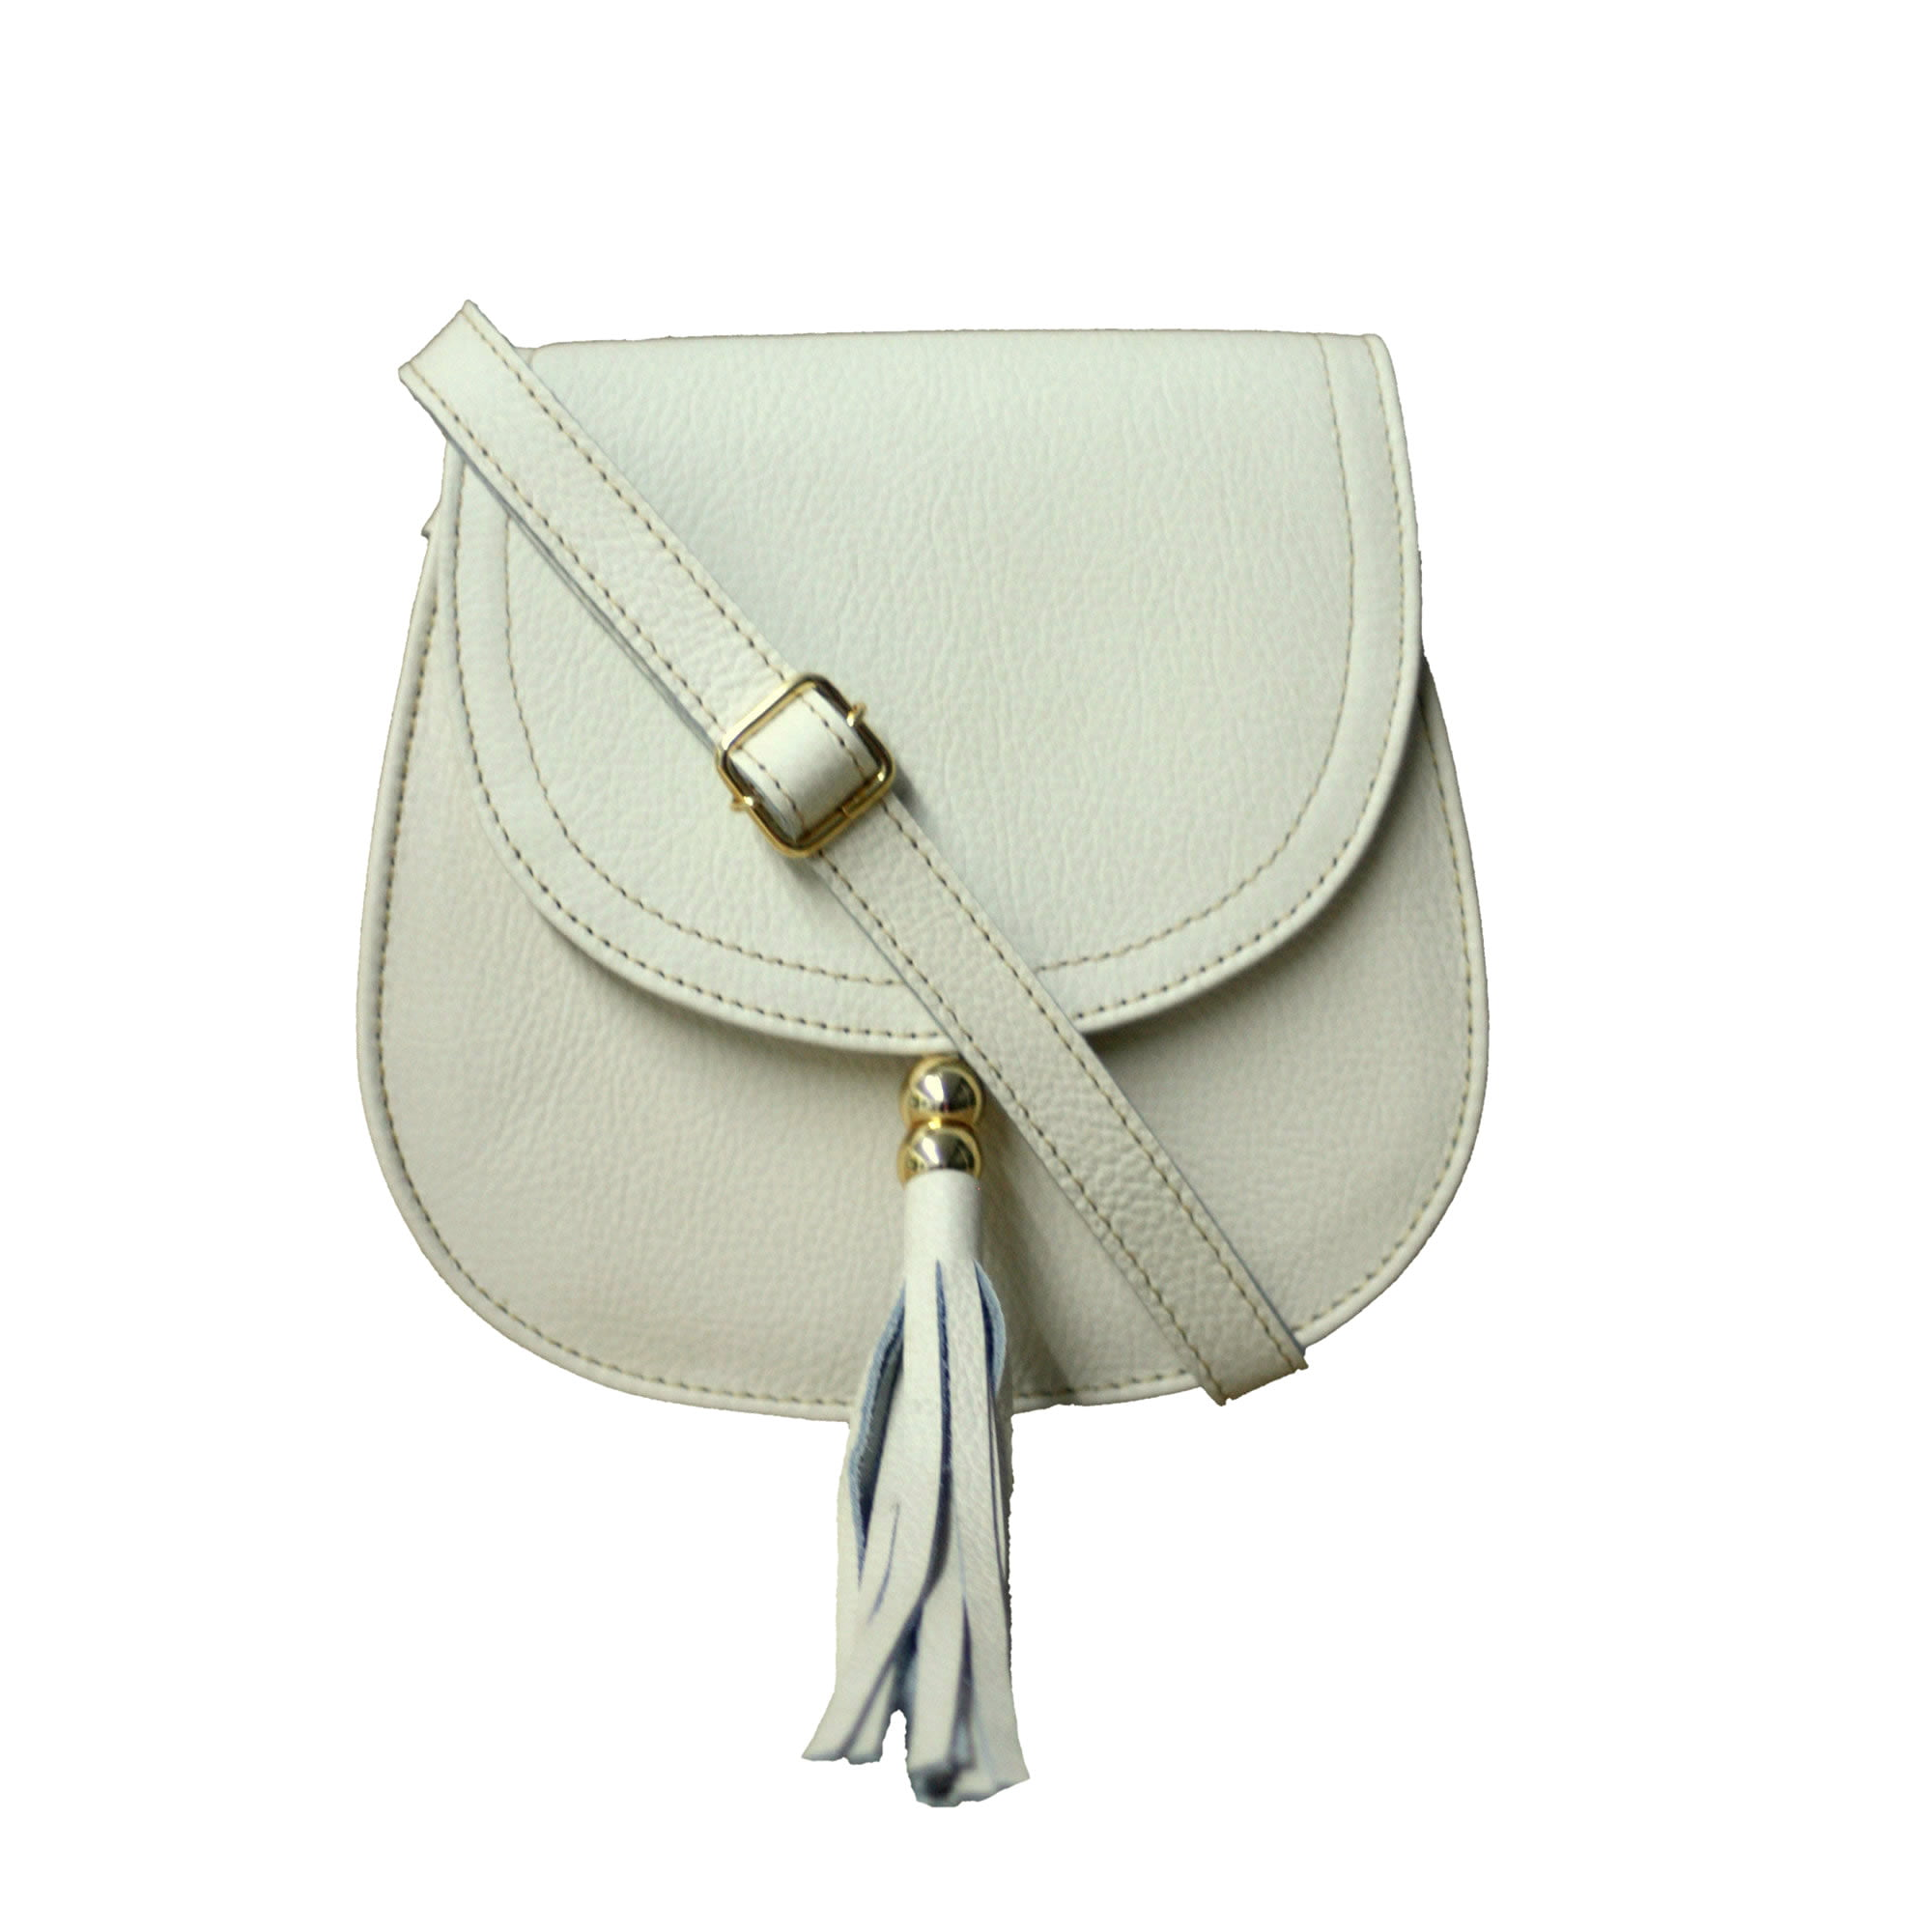 Bolsa de couro estruturada branca Nápoles